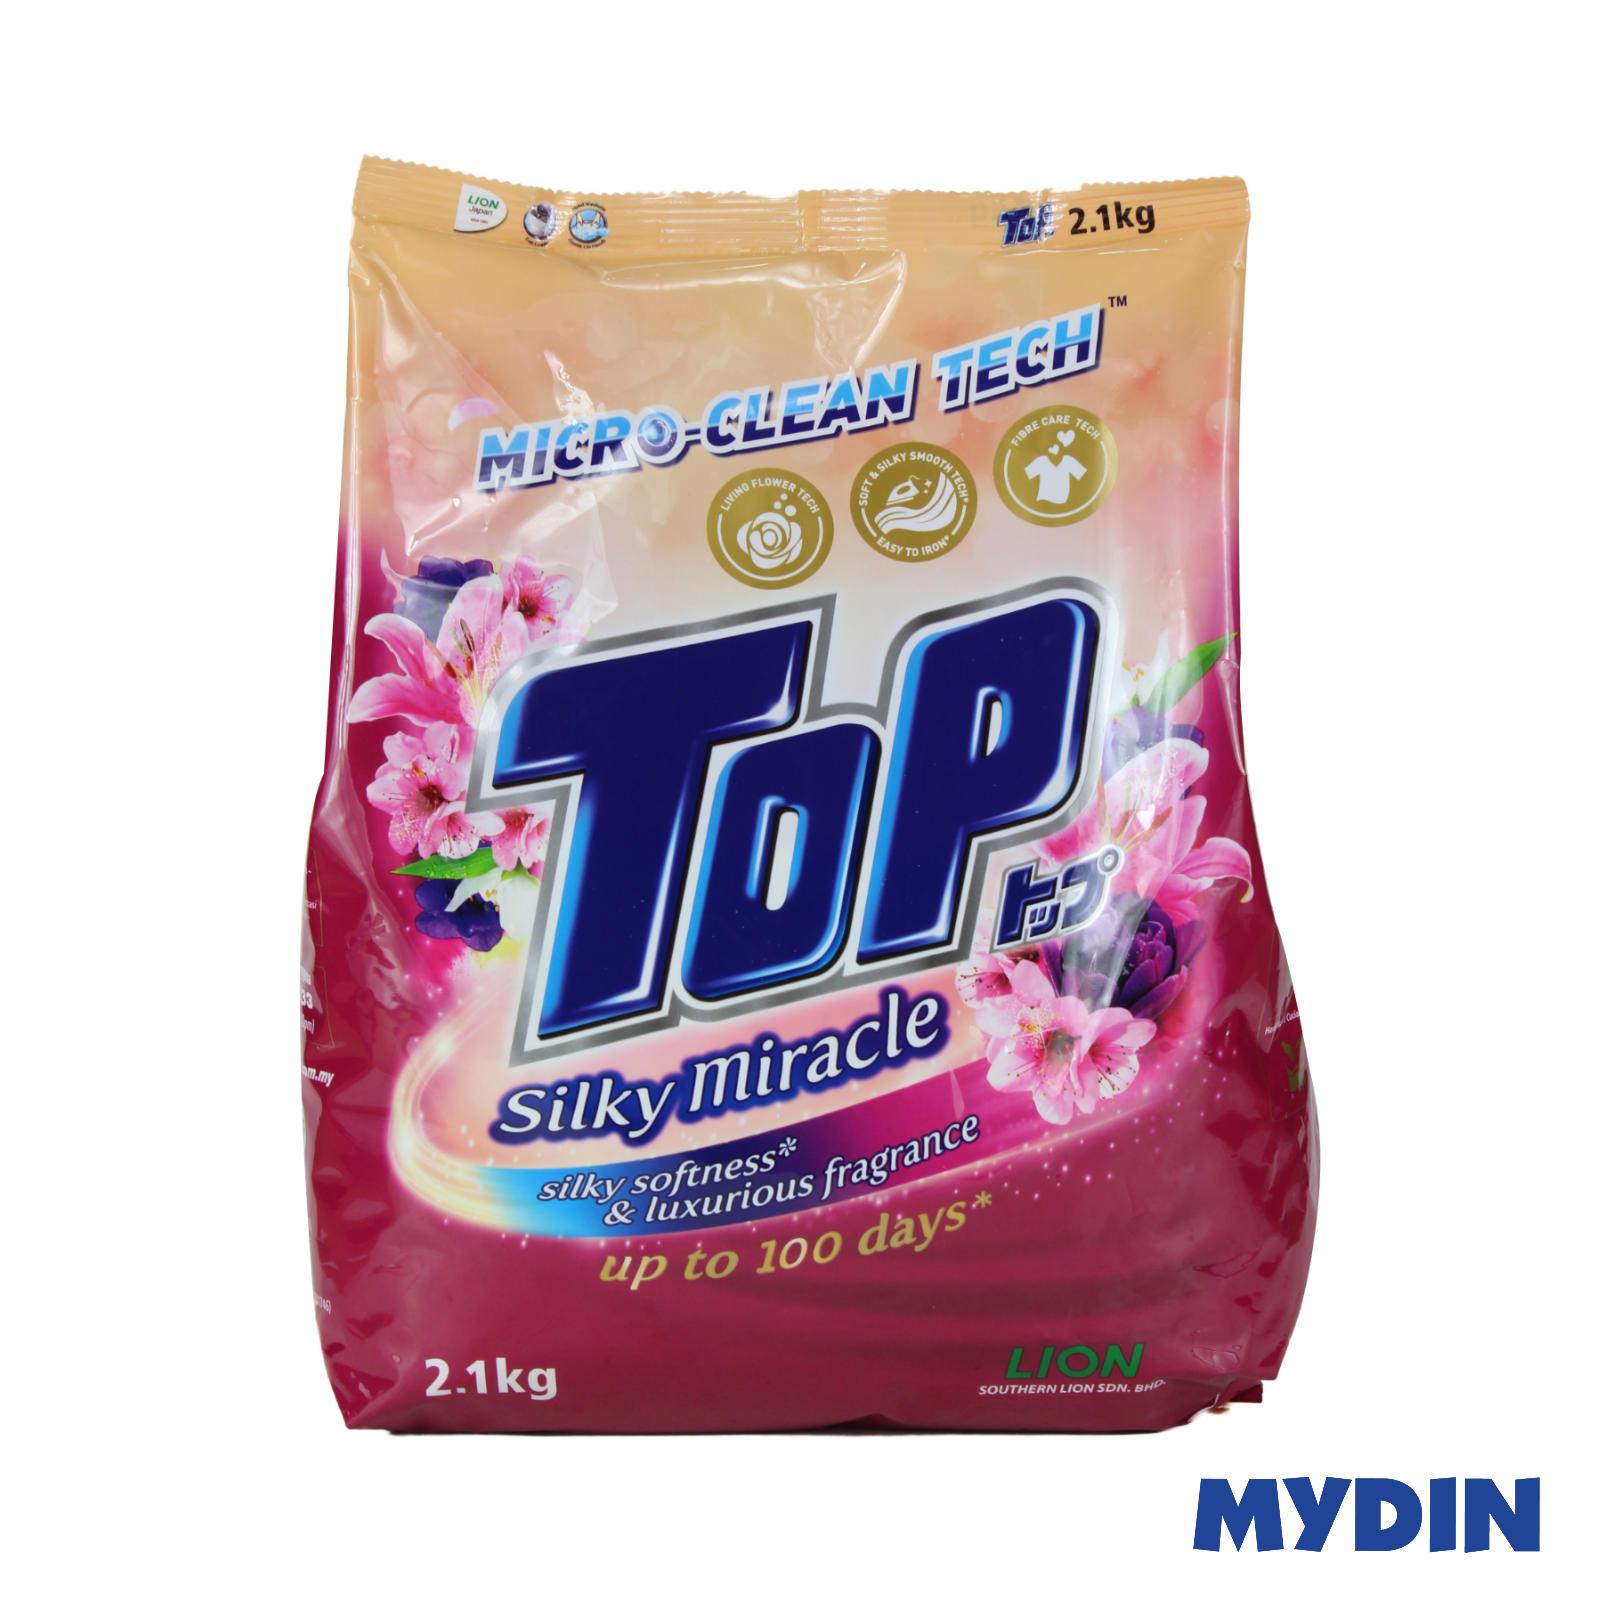 Top Detergent Powder Silky Miracle (2.1kg)